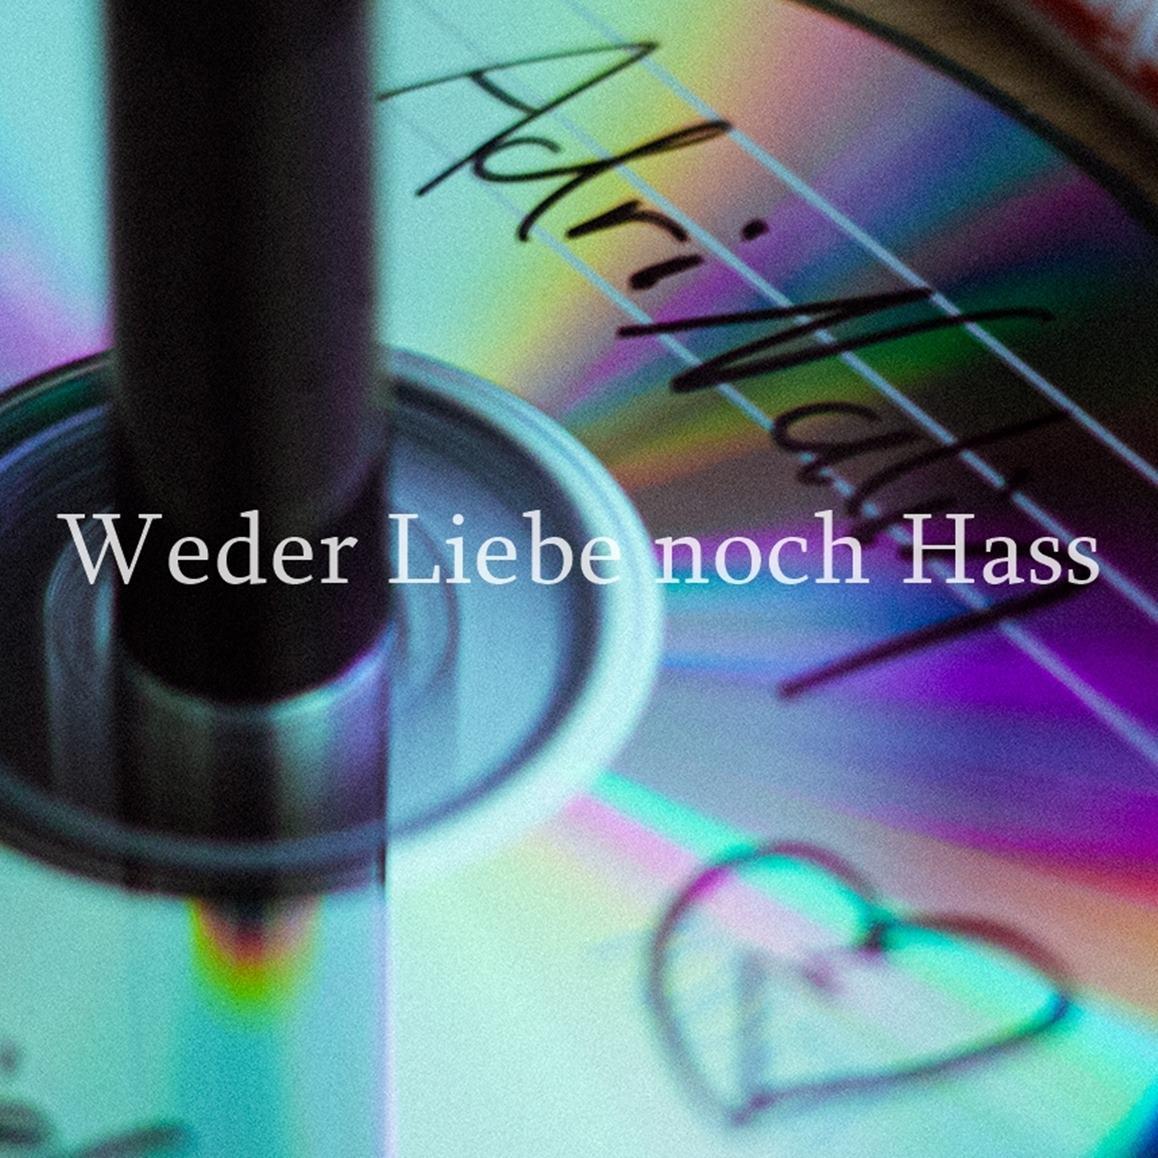 Upcoming: AdriNalin - Weder Liebe Noch Hass